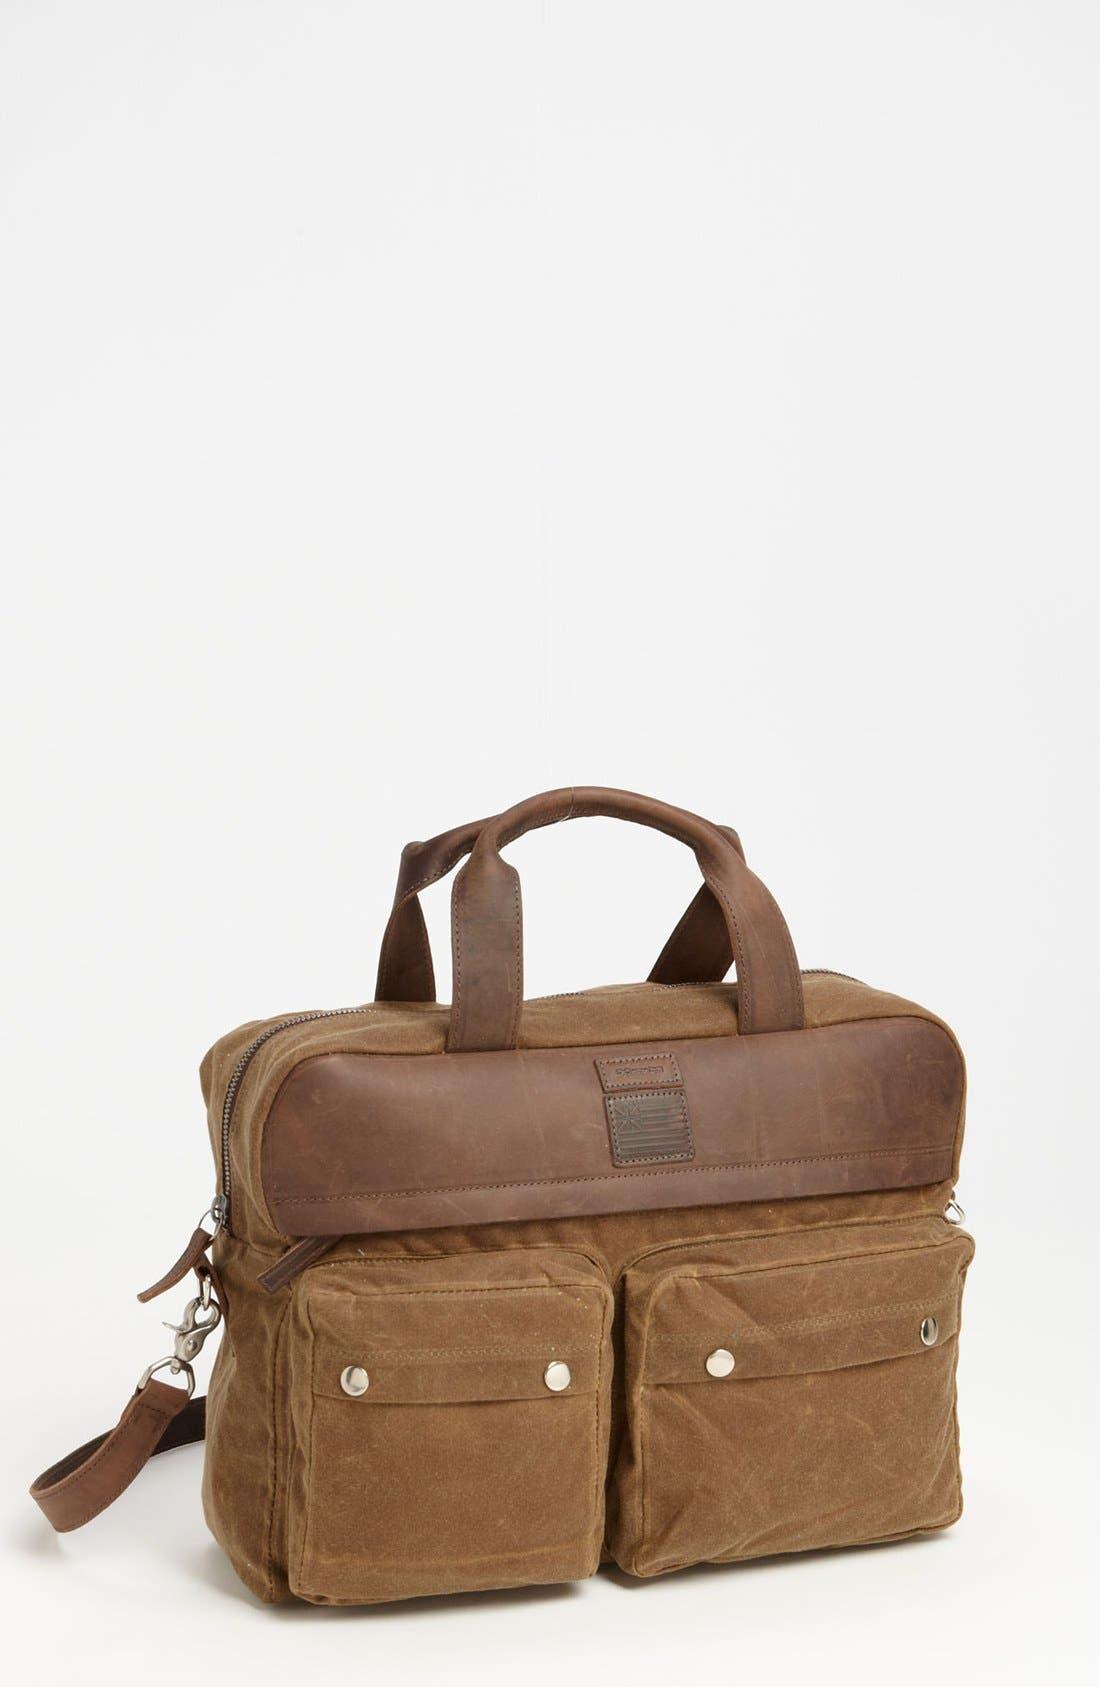 Alternate Image 1 Selected - Insubordinate Lads 'Spencer' Laptop Briefcase